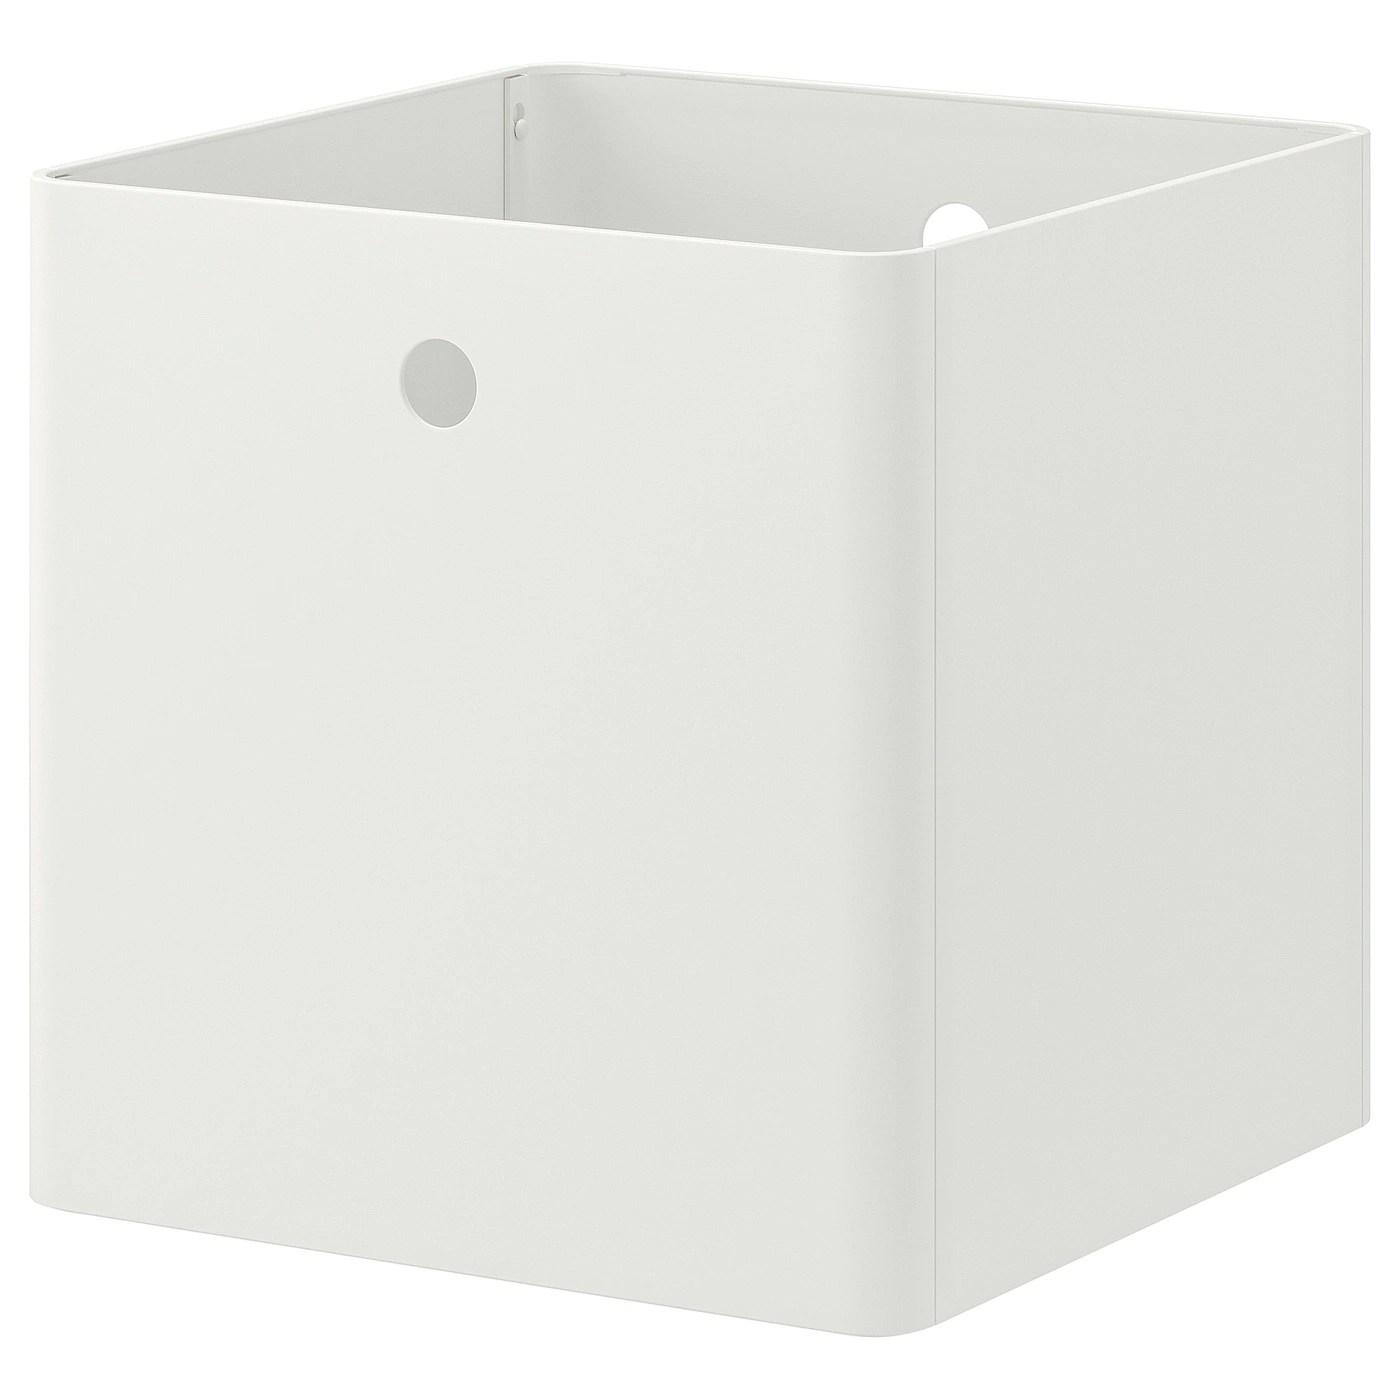 Kuggis Boite De Rangement Blanc Materiau Durable Ikea